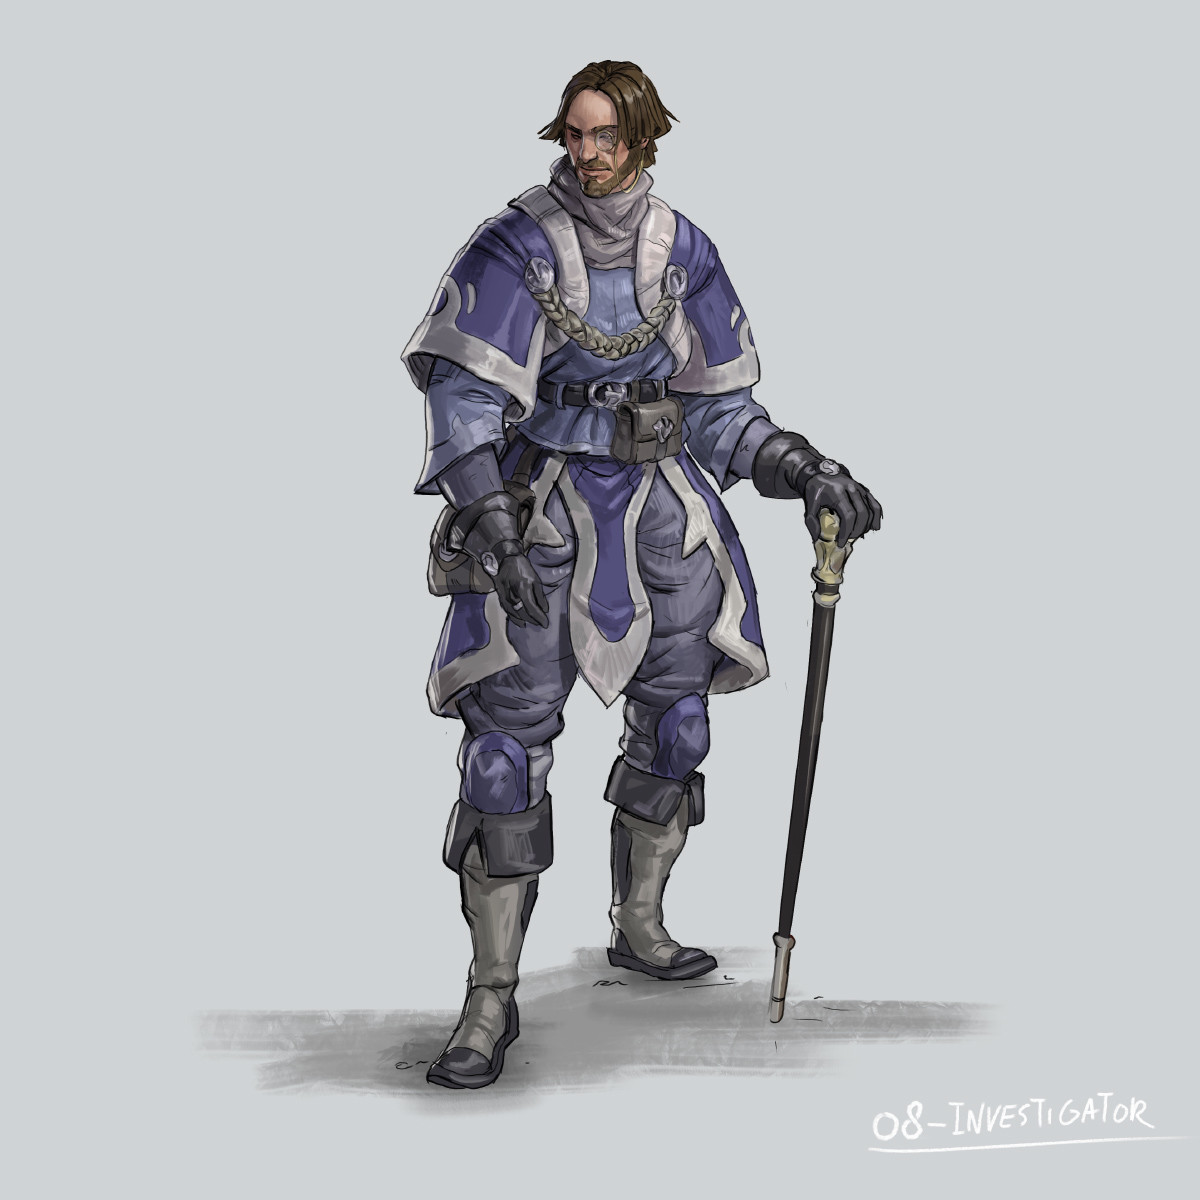 RPG Class day 08: investigator